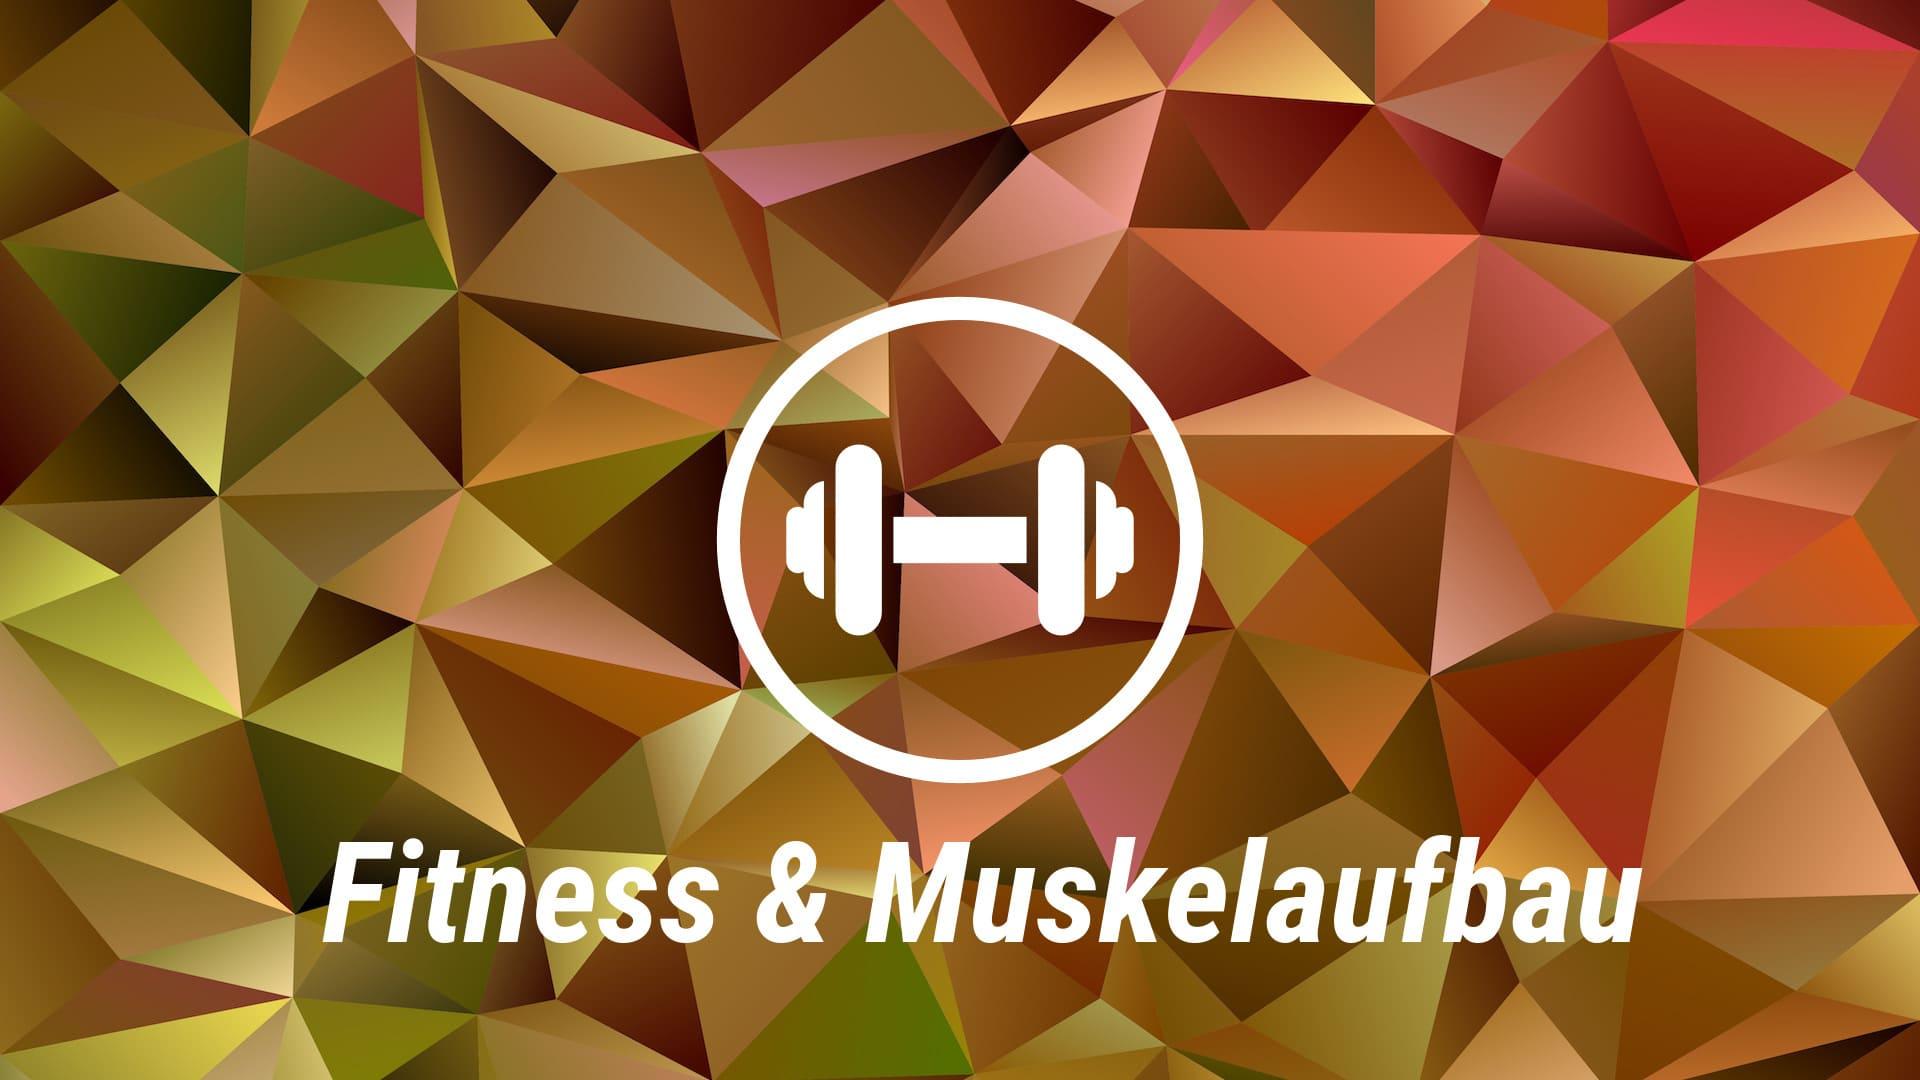 Fitness & Muskelaufbau Kurs Kategorie